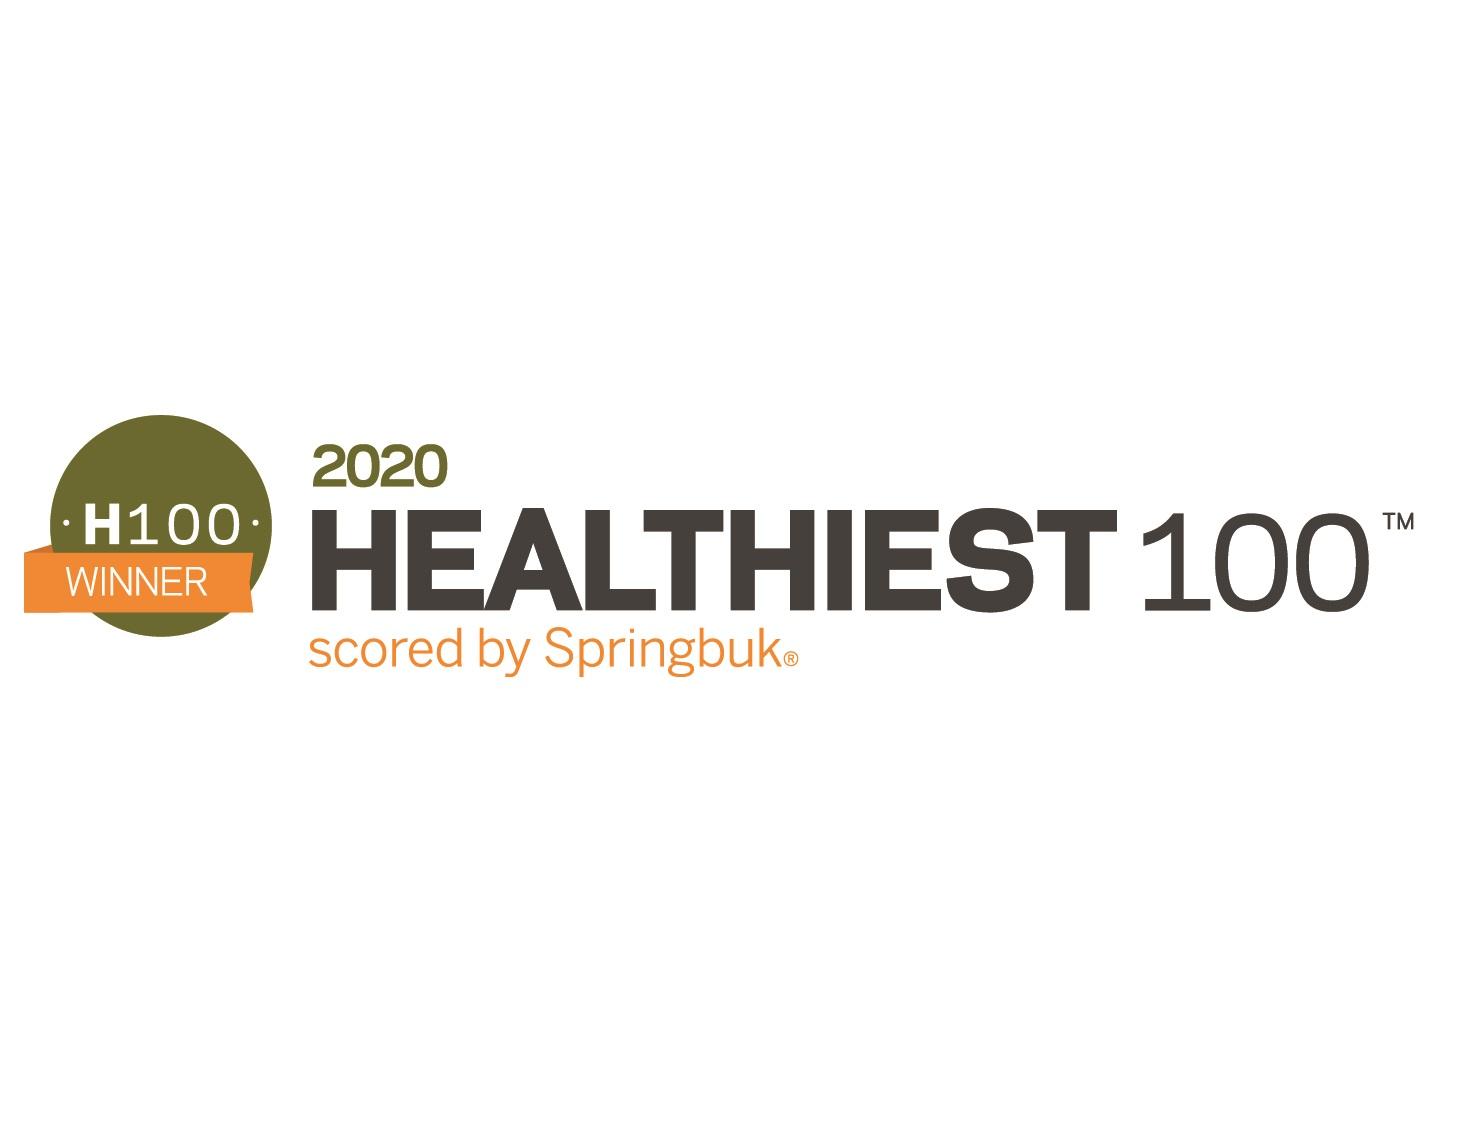 h100-winners-badge2020/